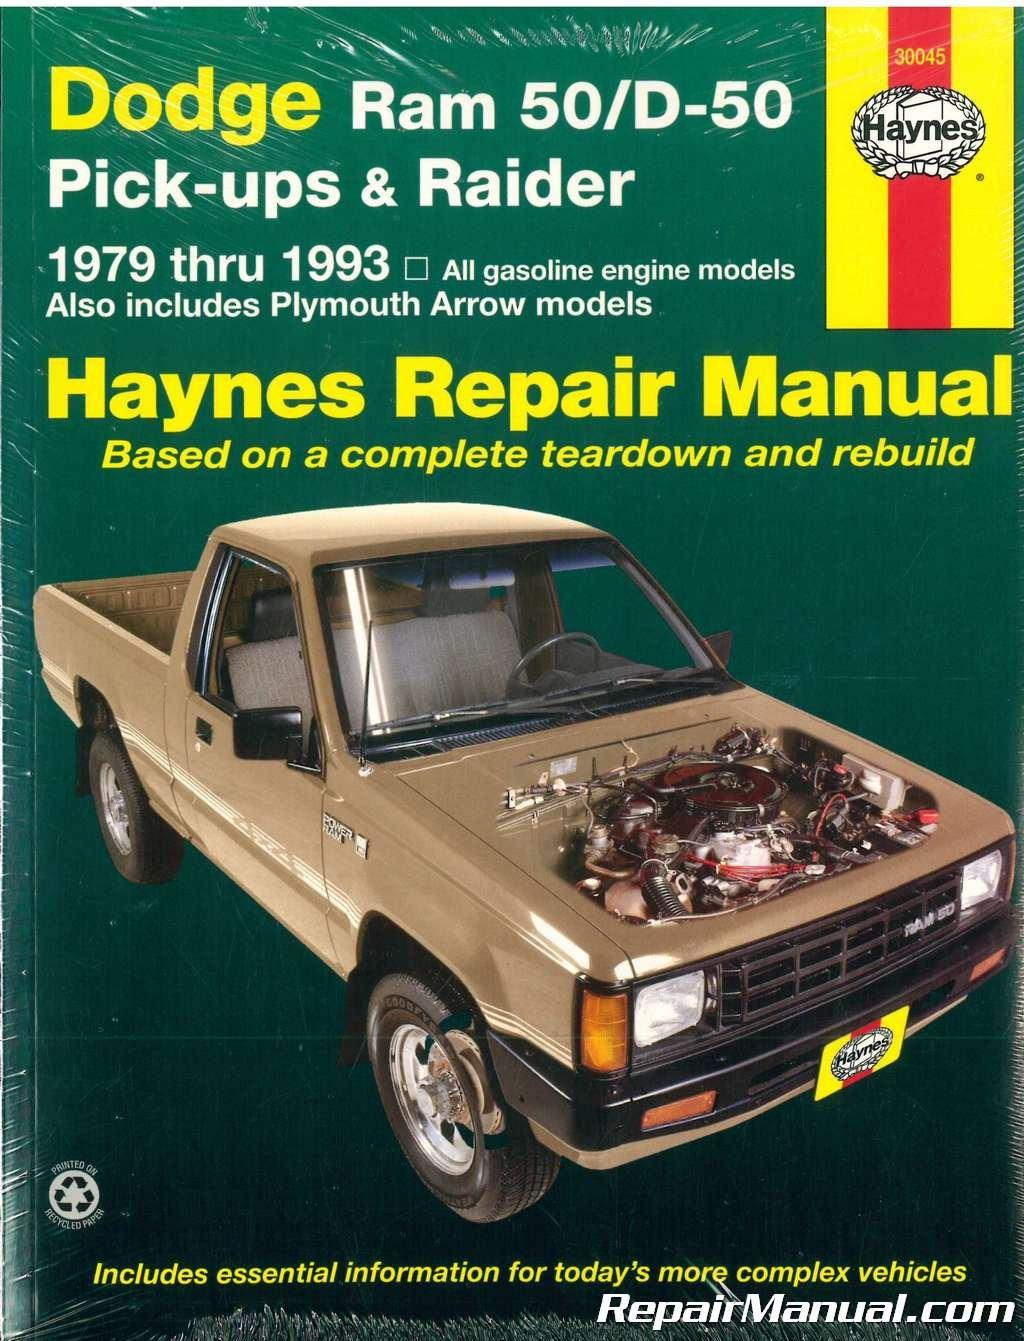 H30045 Haynes Dodge Ram 50 D50 Pick-up Raider and Plymouth Arrow Pick-up 1979-1993 Auto Repair Manual pdf